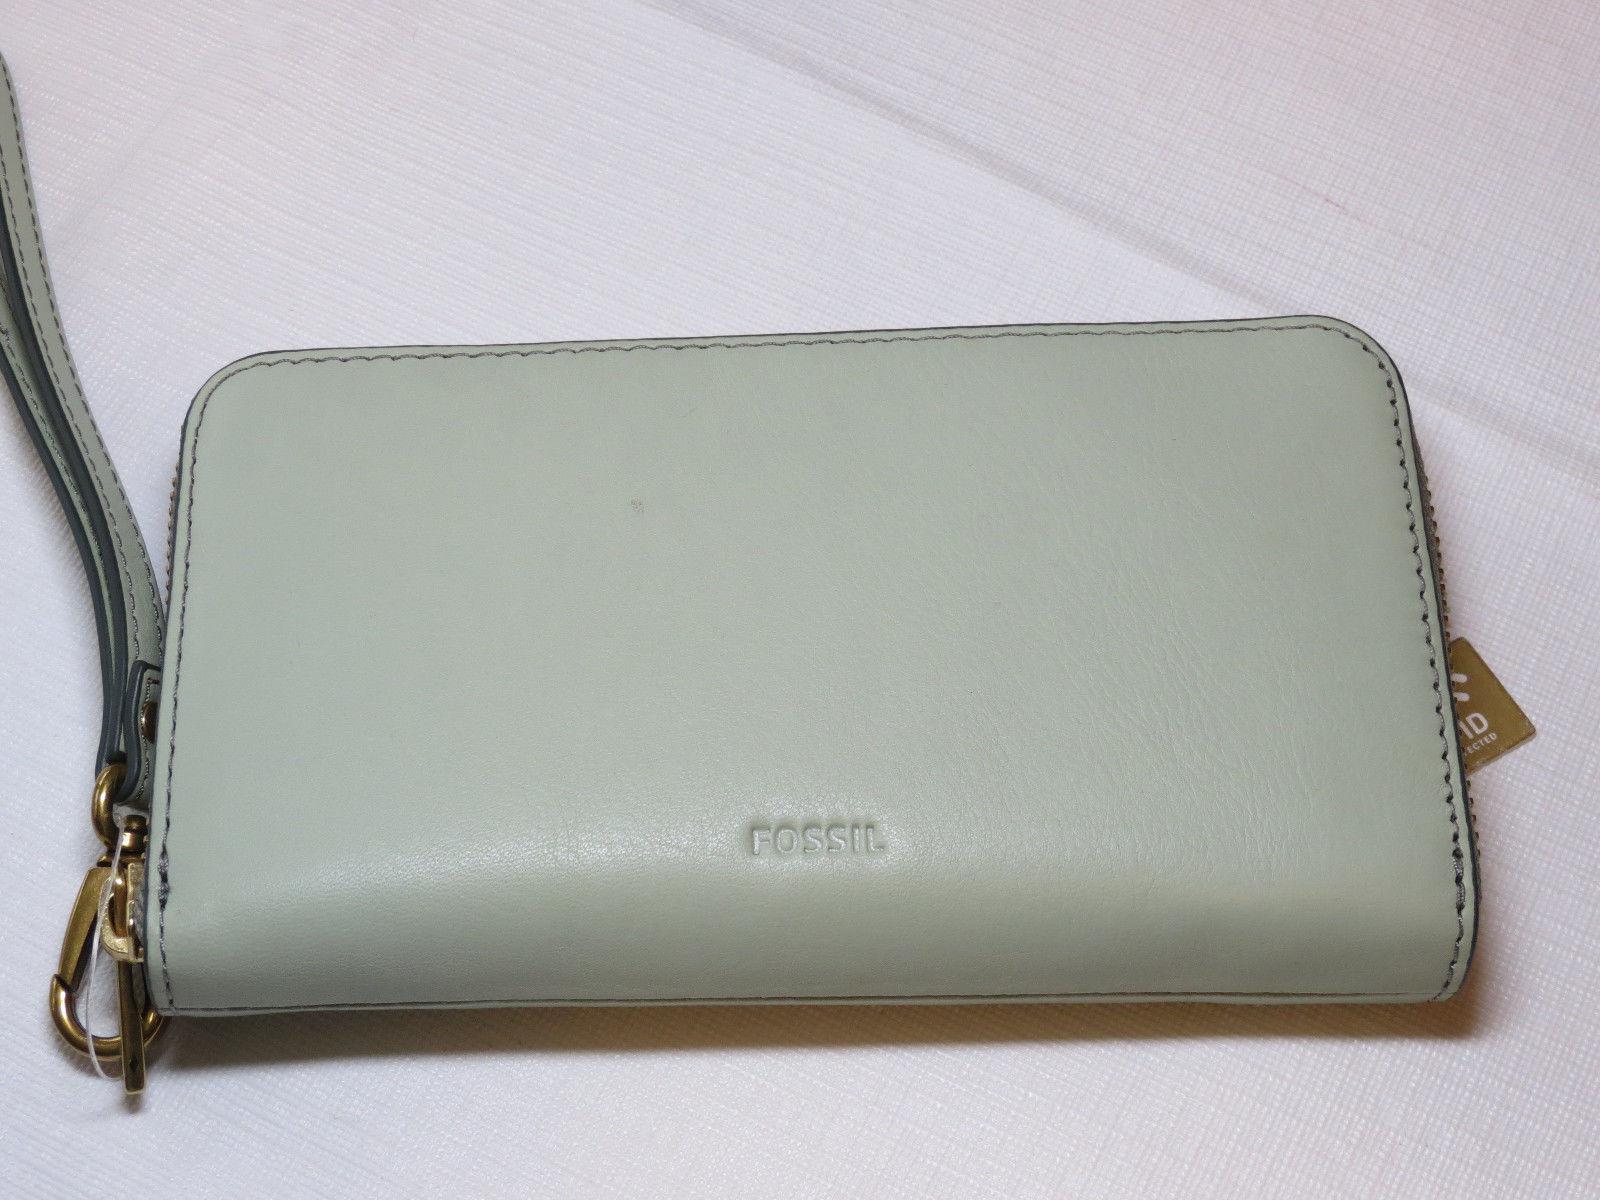 Fossil SL7151336 RFID Emma Smartphone Wristlet Lght Sage wallet clutch leather*^ image 7